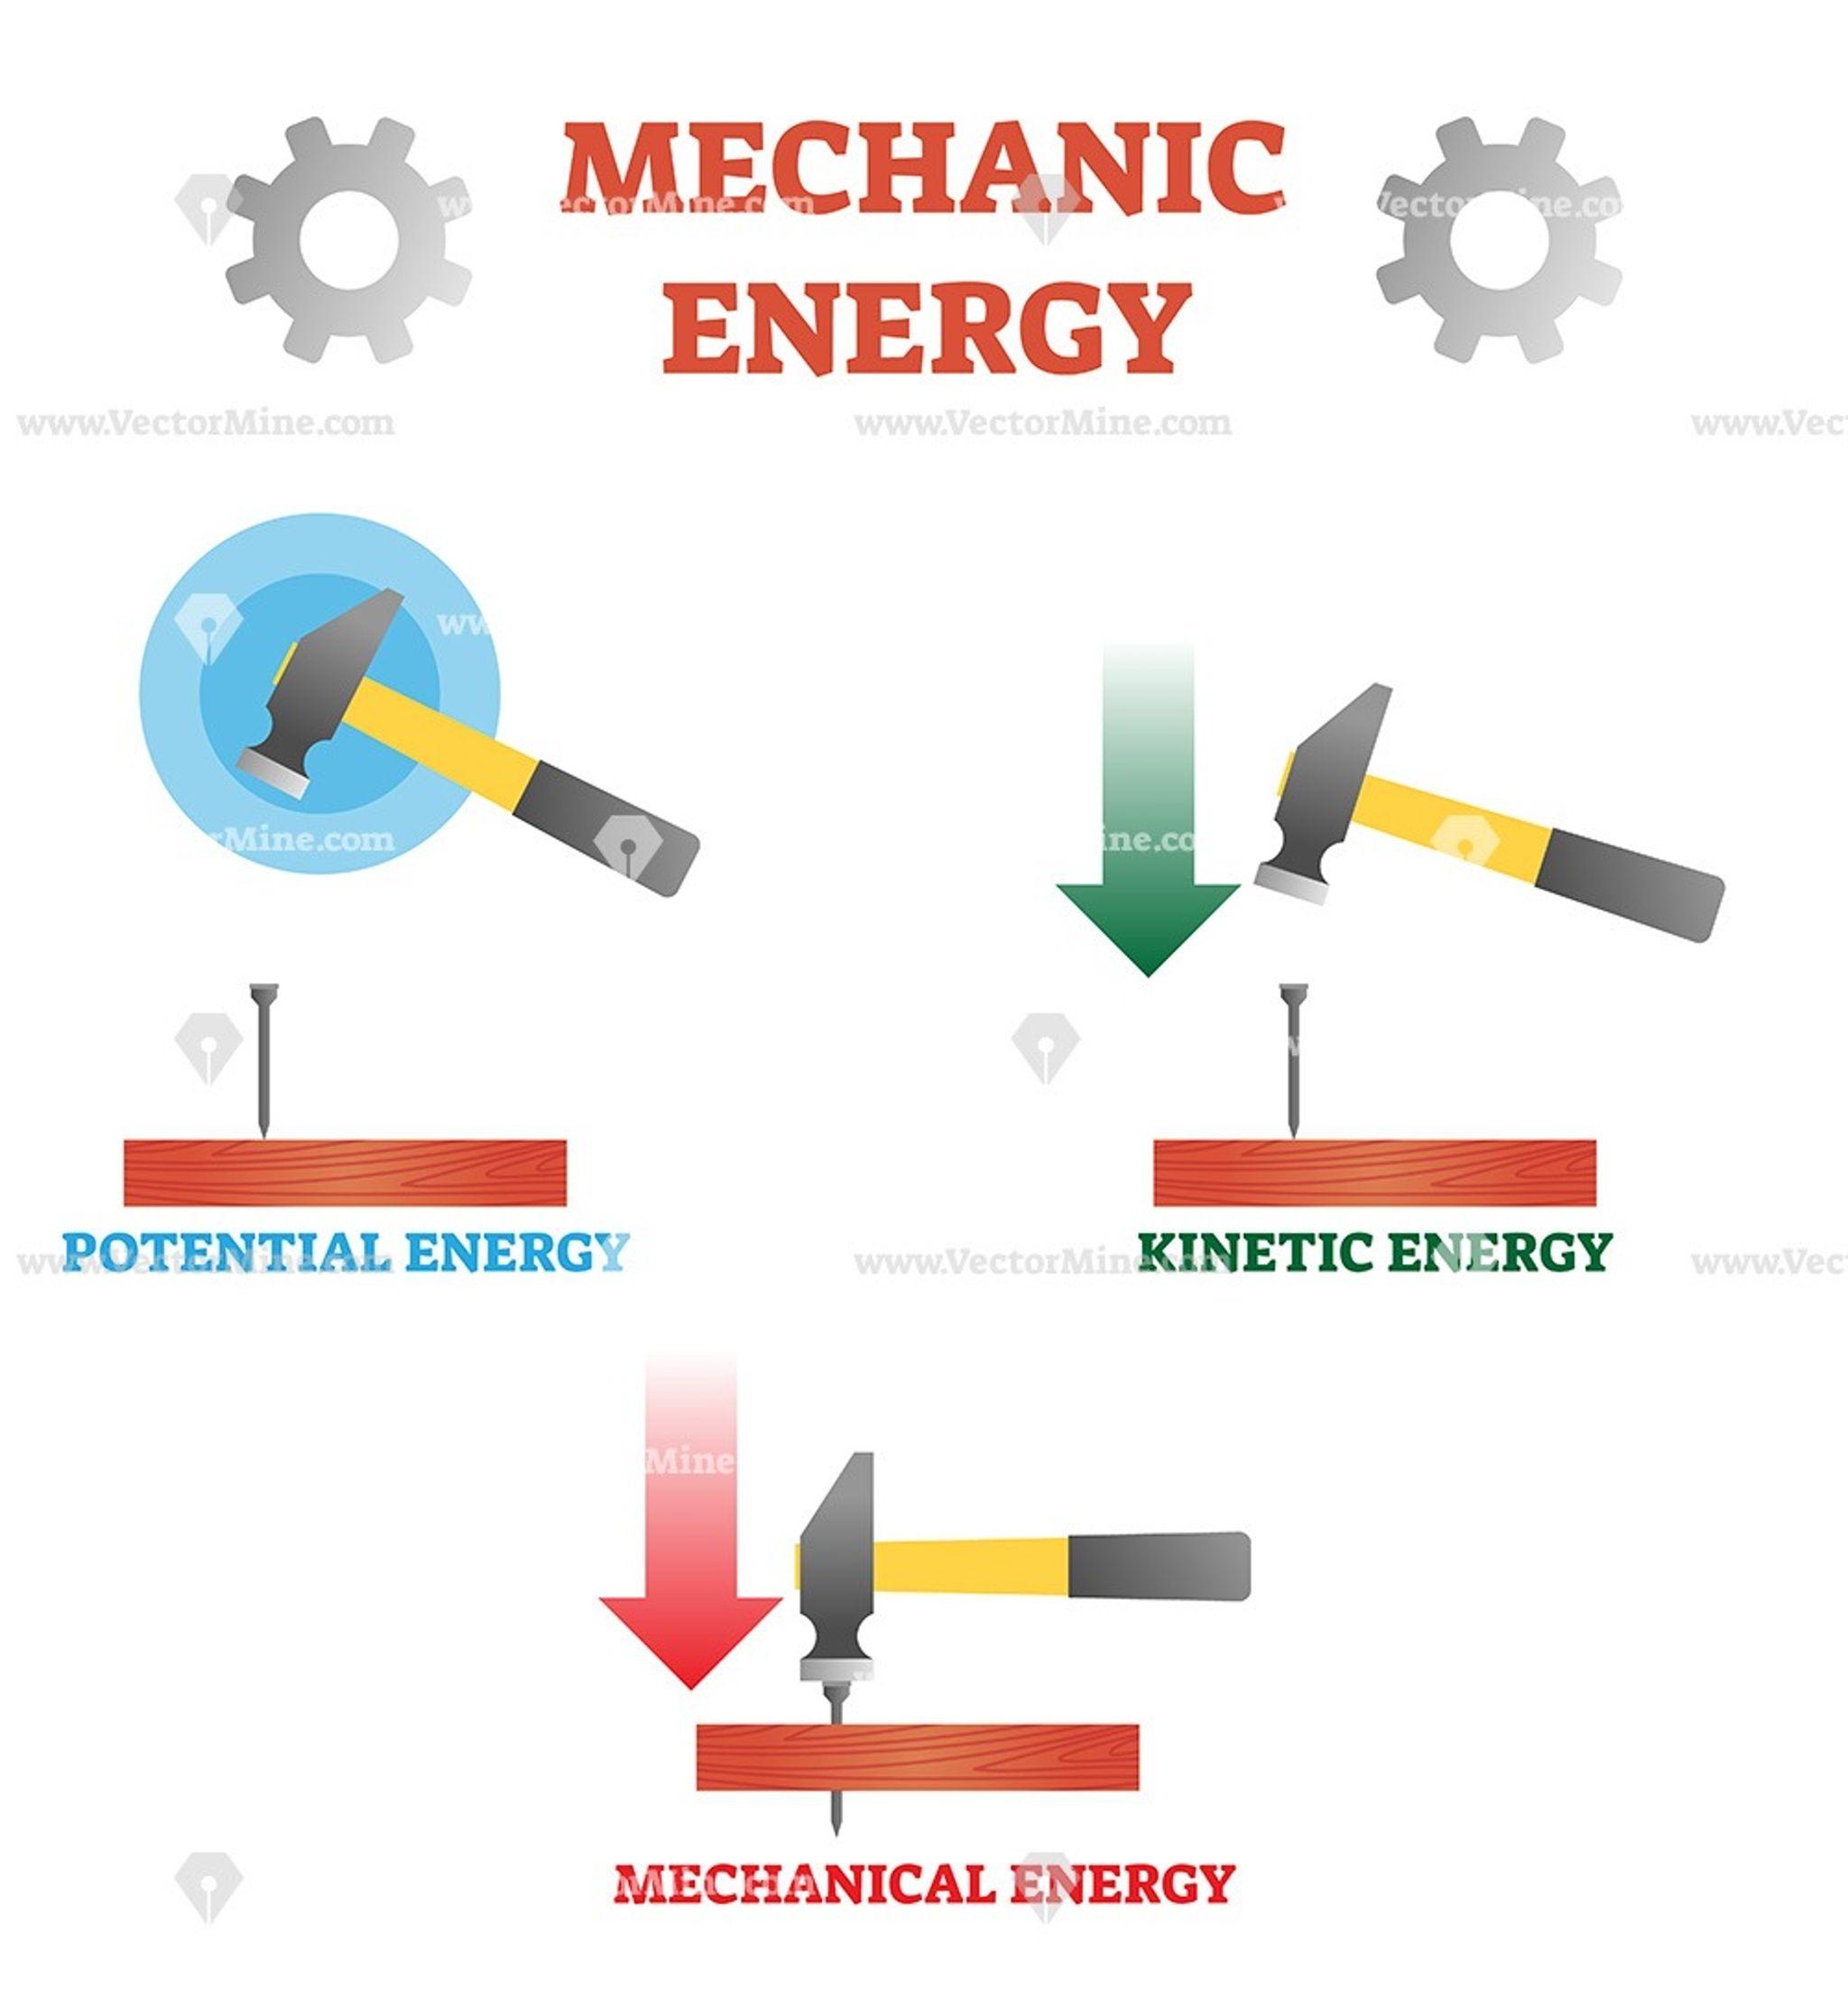 Mechanic Energy Physics Explanation Vector Illustration